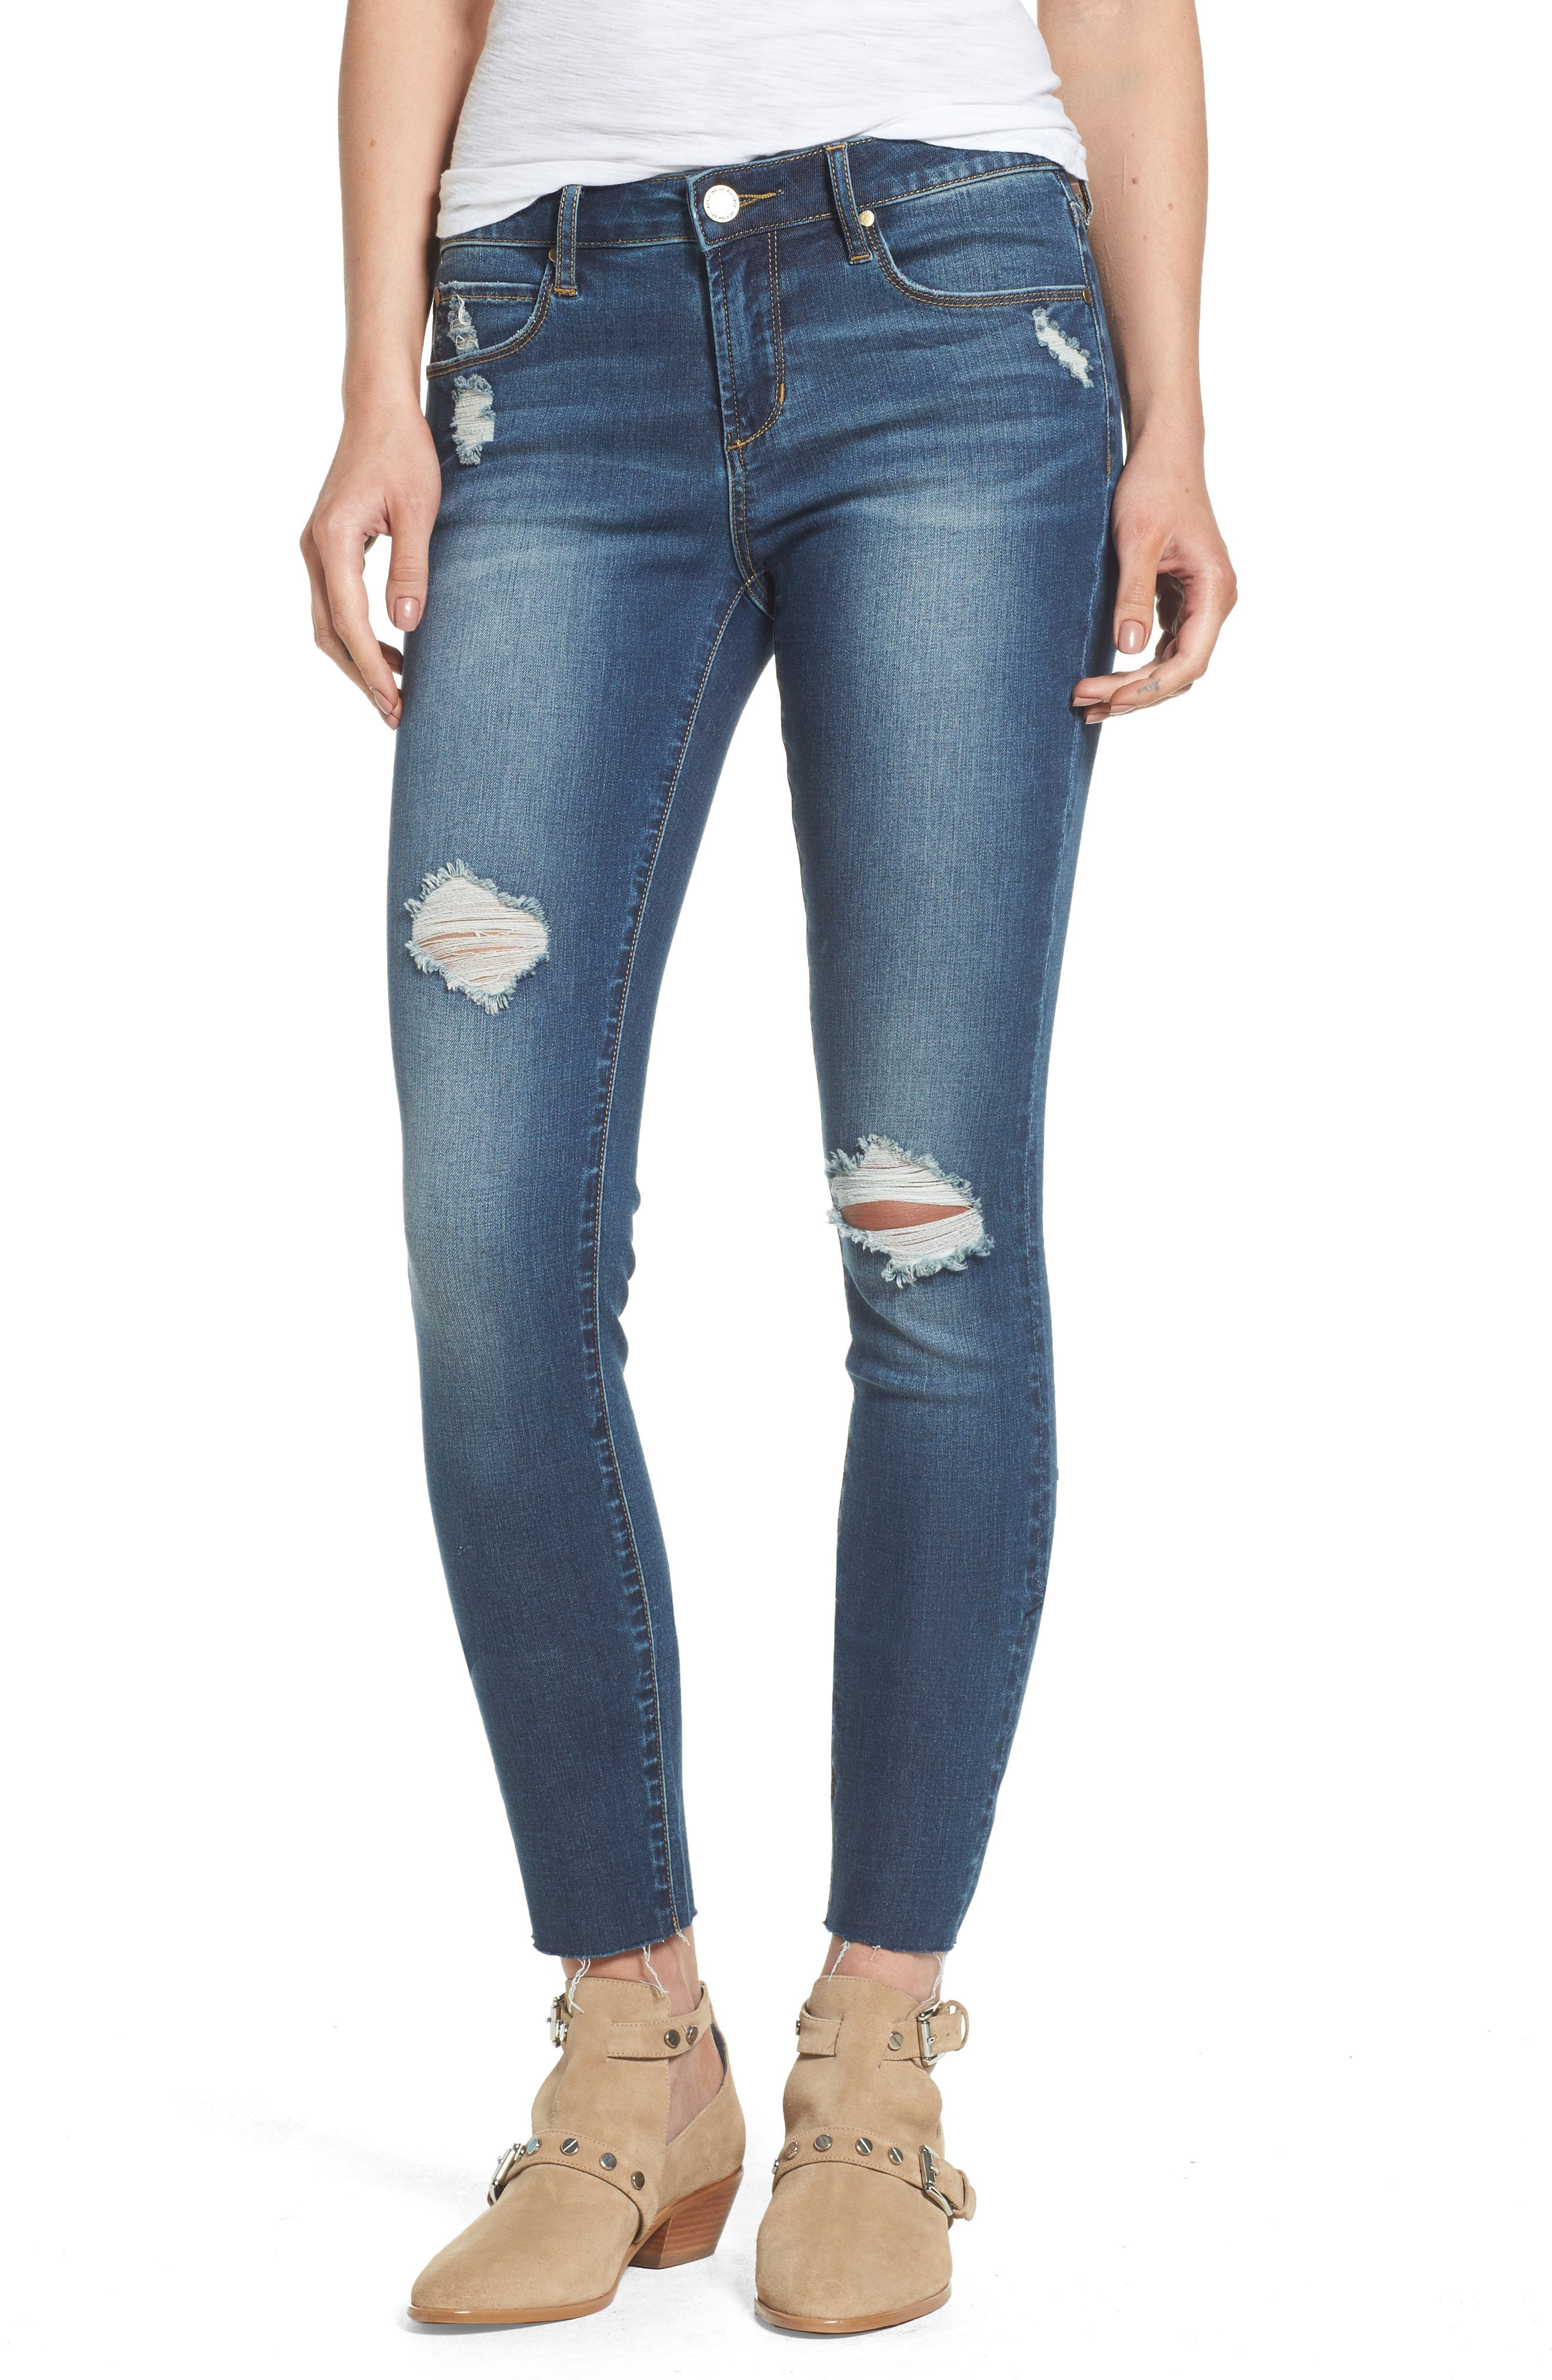 Denim skinny jeans for juniors